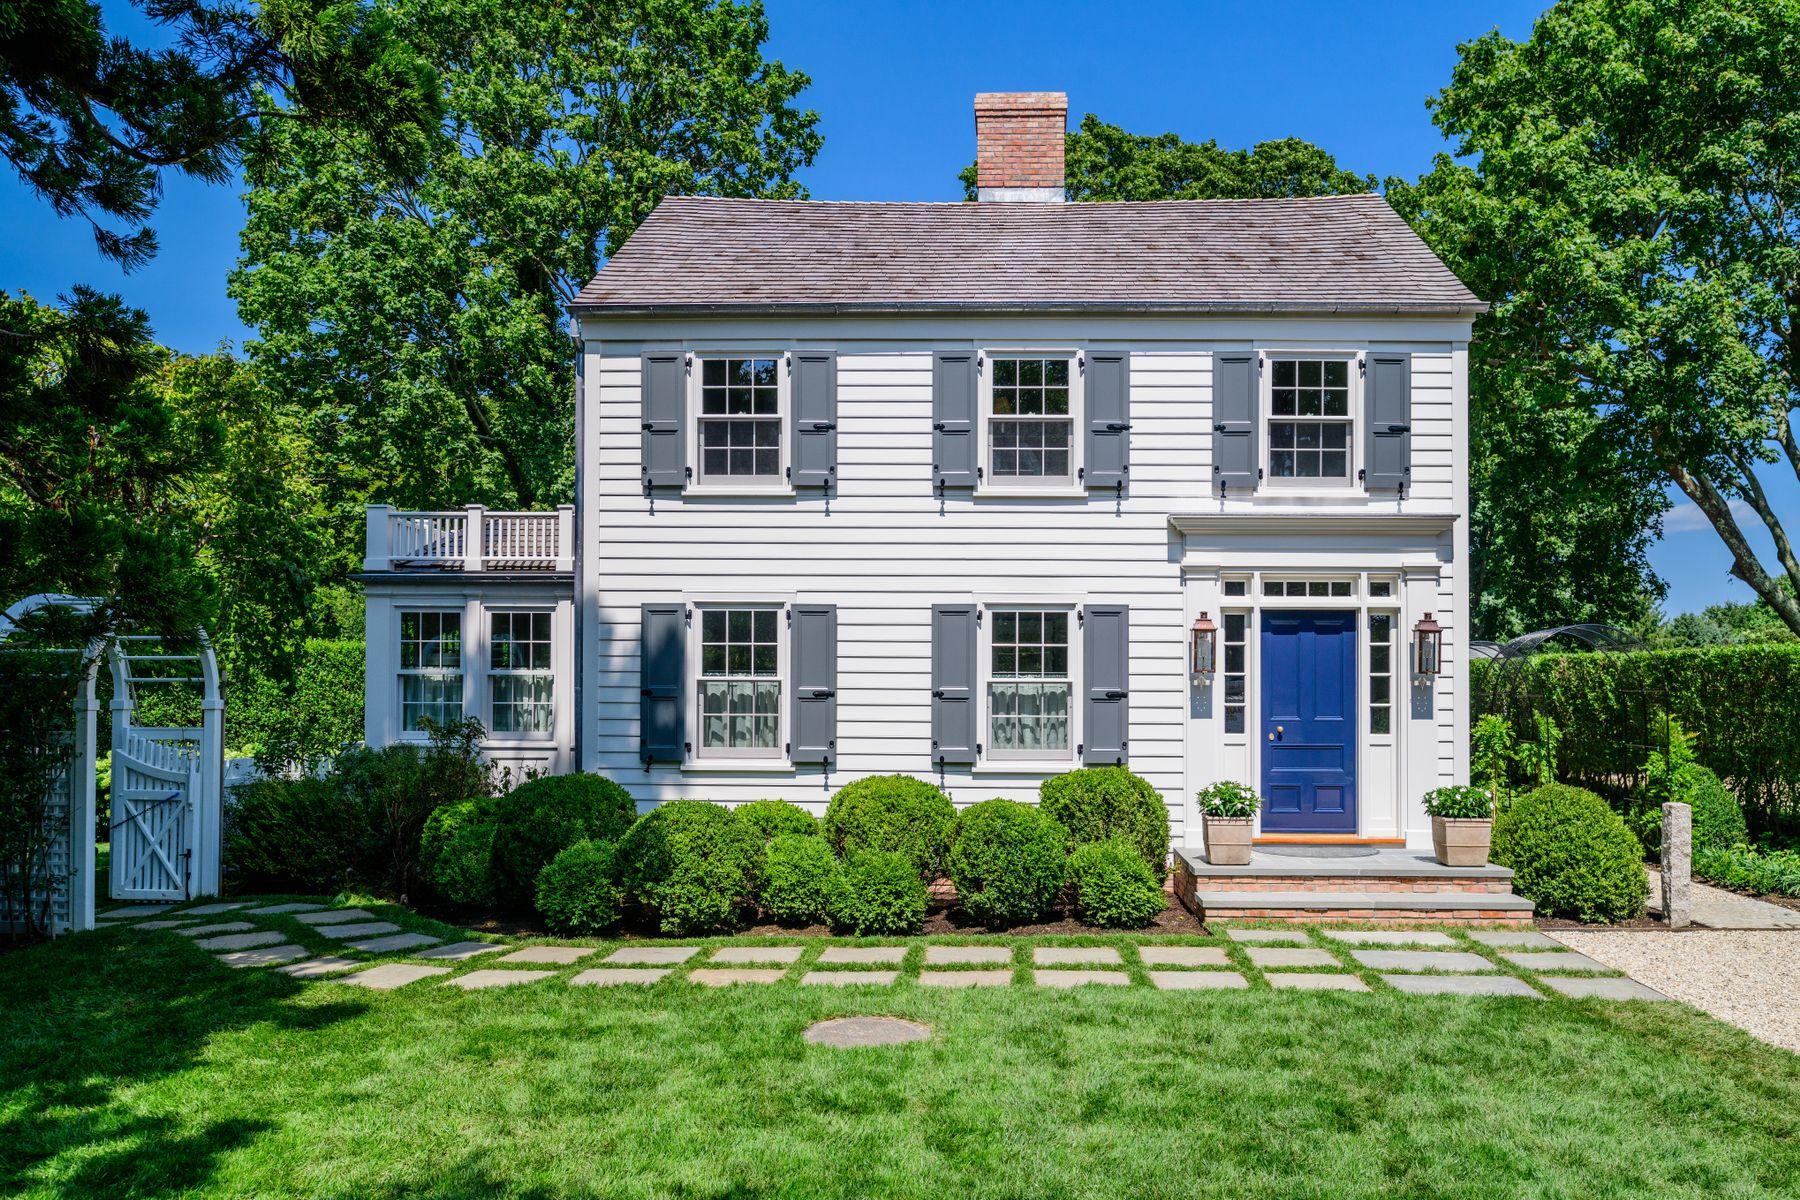 Single Family Home for Active at New Construction in Bridgehampton Bridgehampton, New York 11932 United States